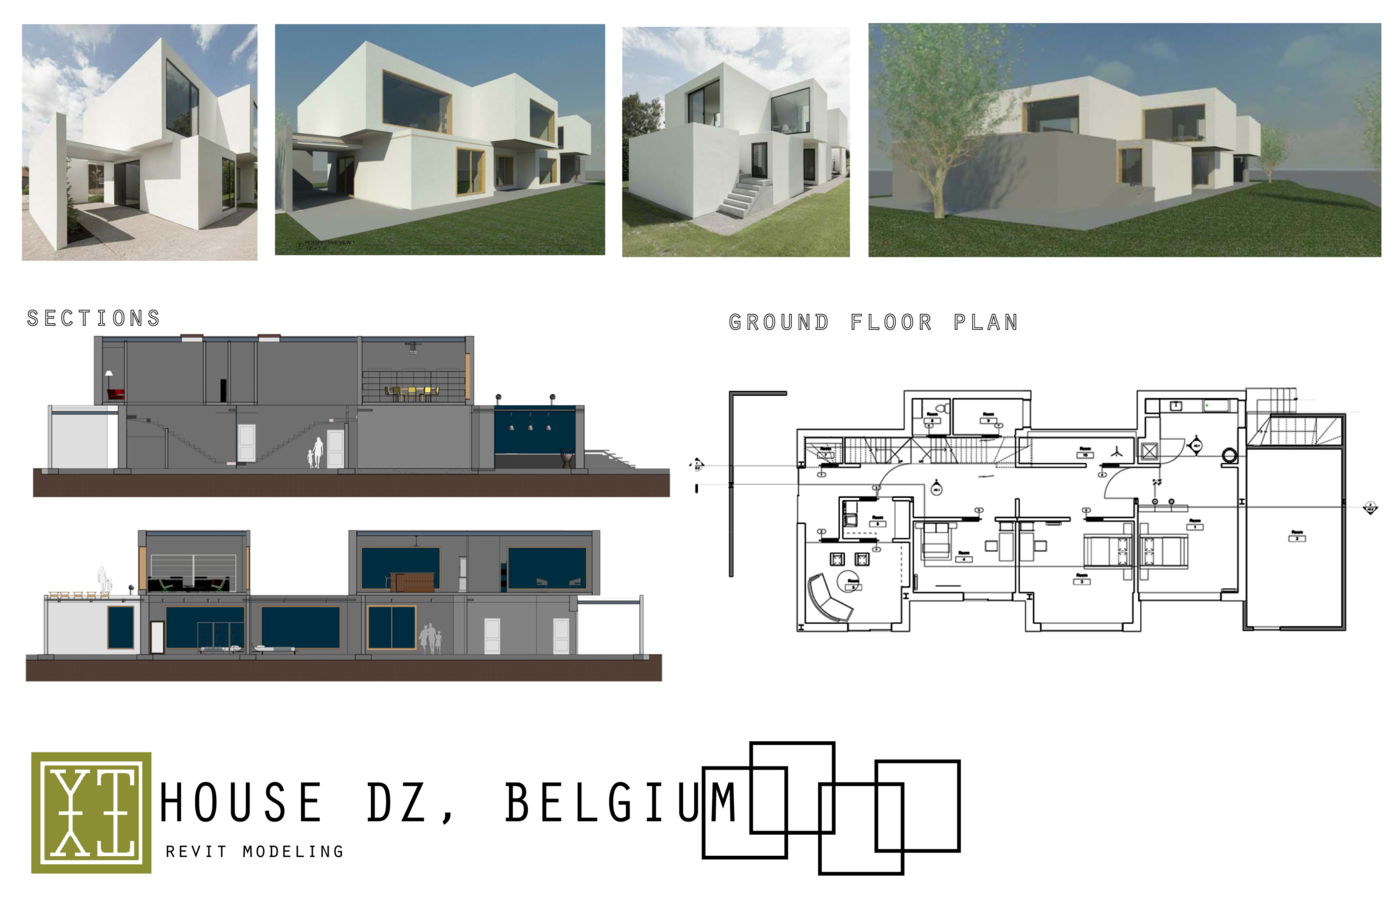 House DZ   Revit Modeling by Yuri Tag at Coroflot com